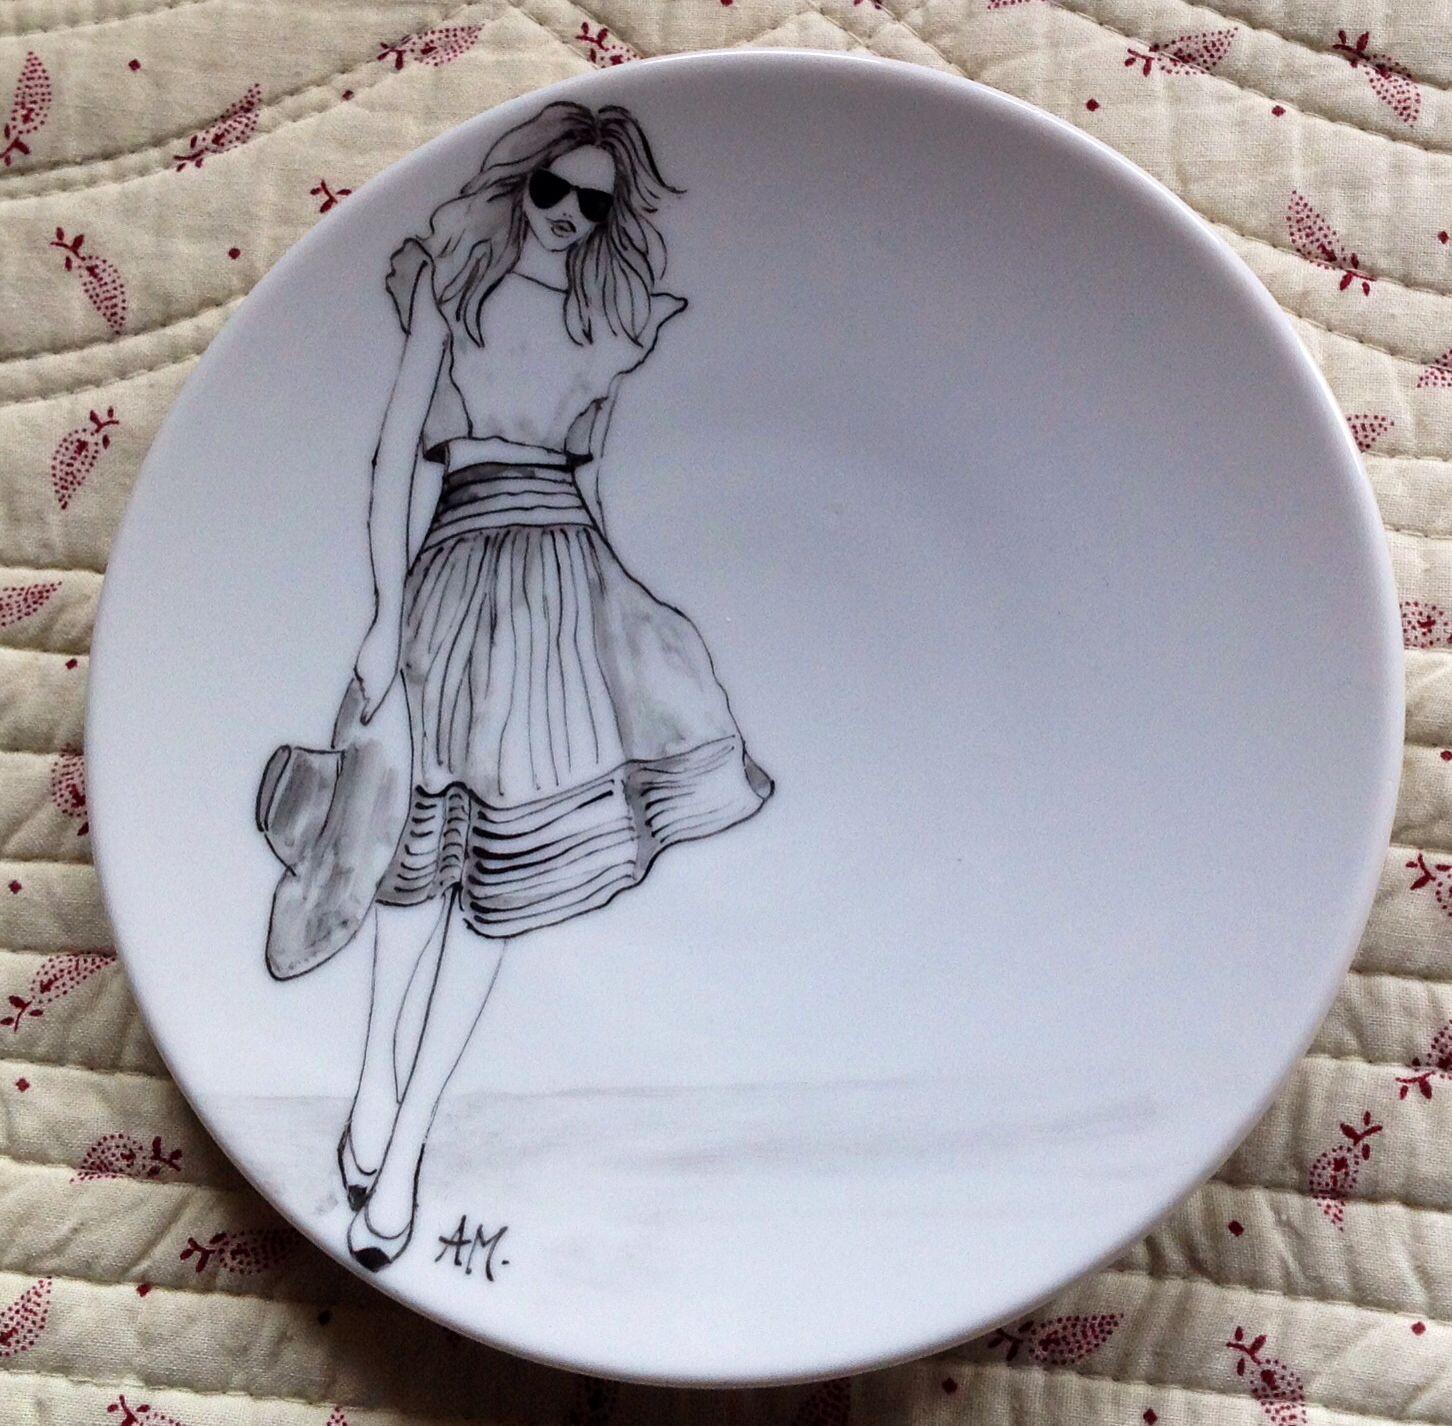 piattini frutta porcellana a delineo peinture porcelaine. Black Bedroom Furniture Sets. Home Design Ideas